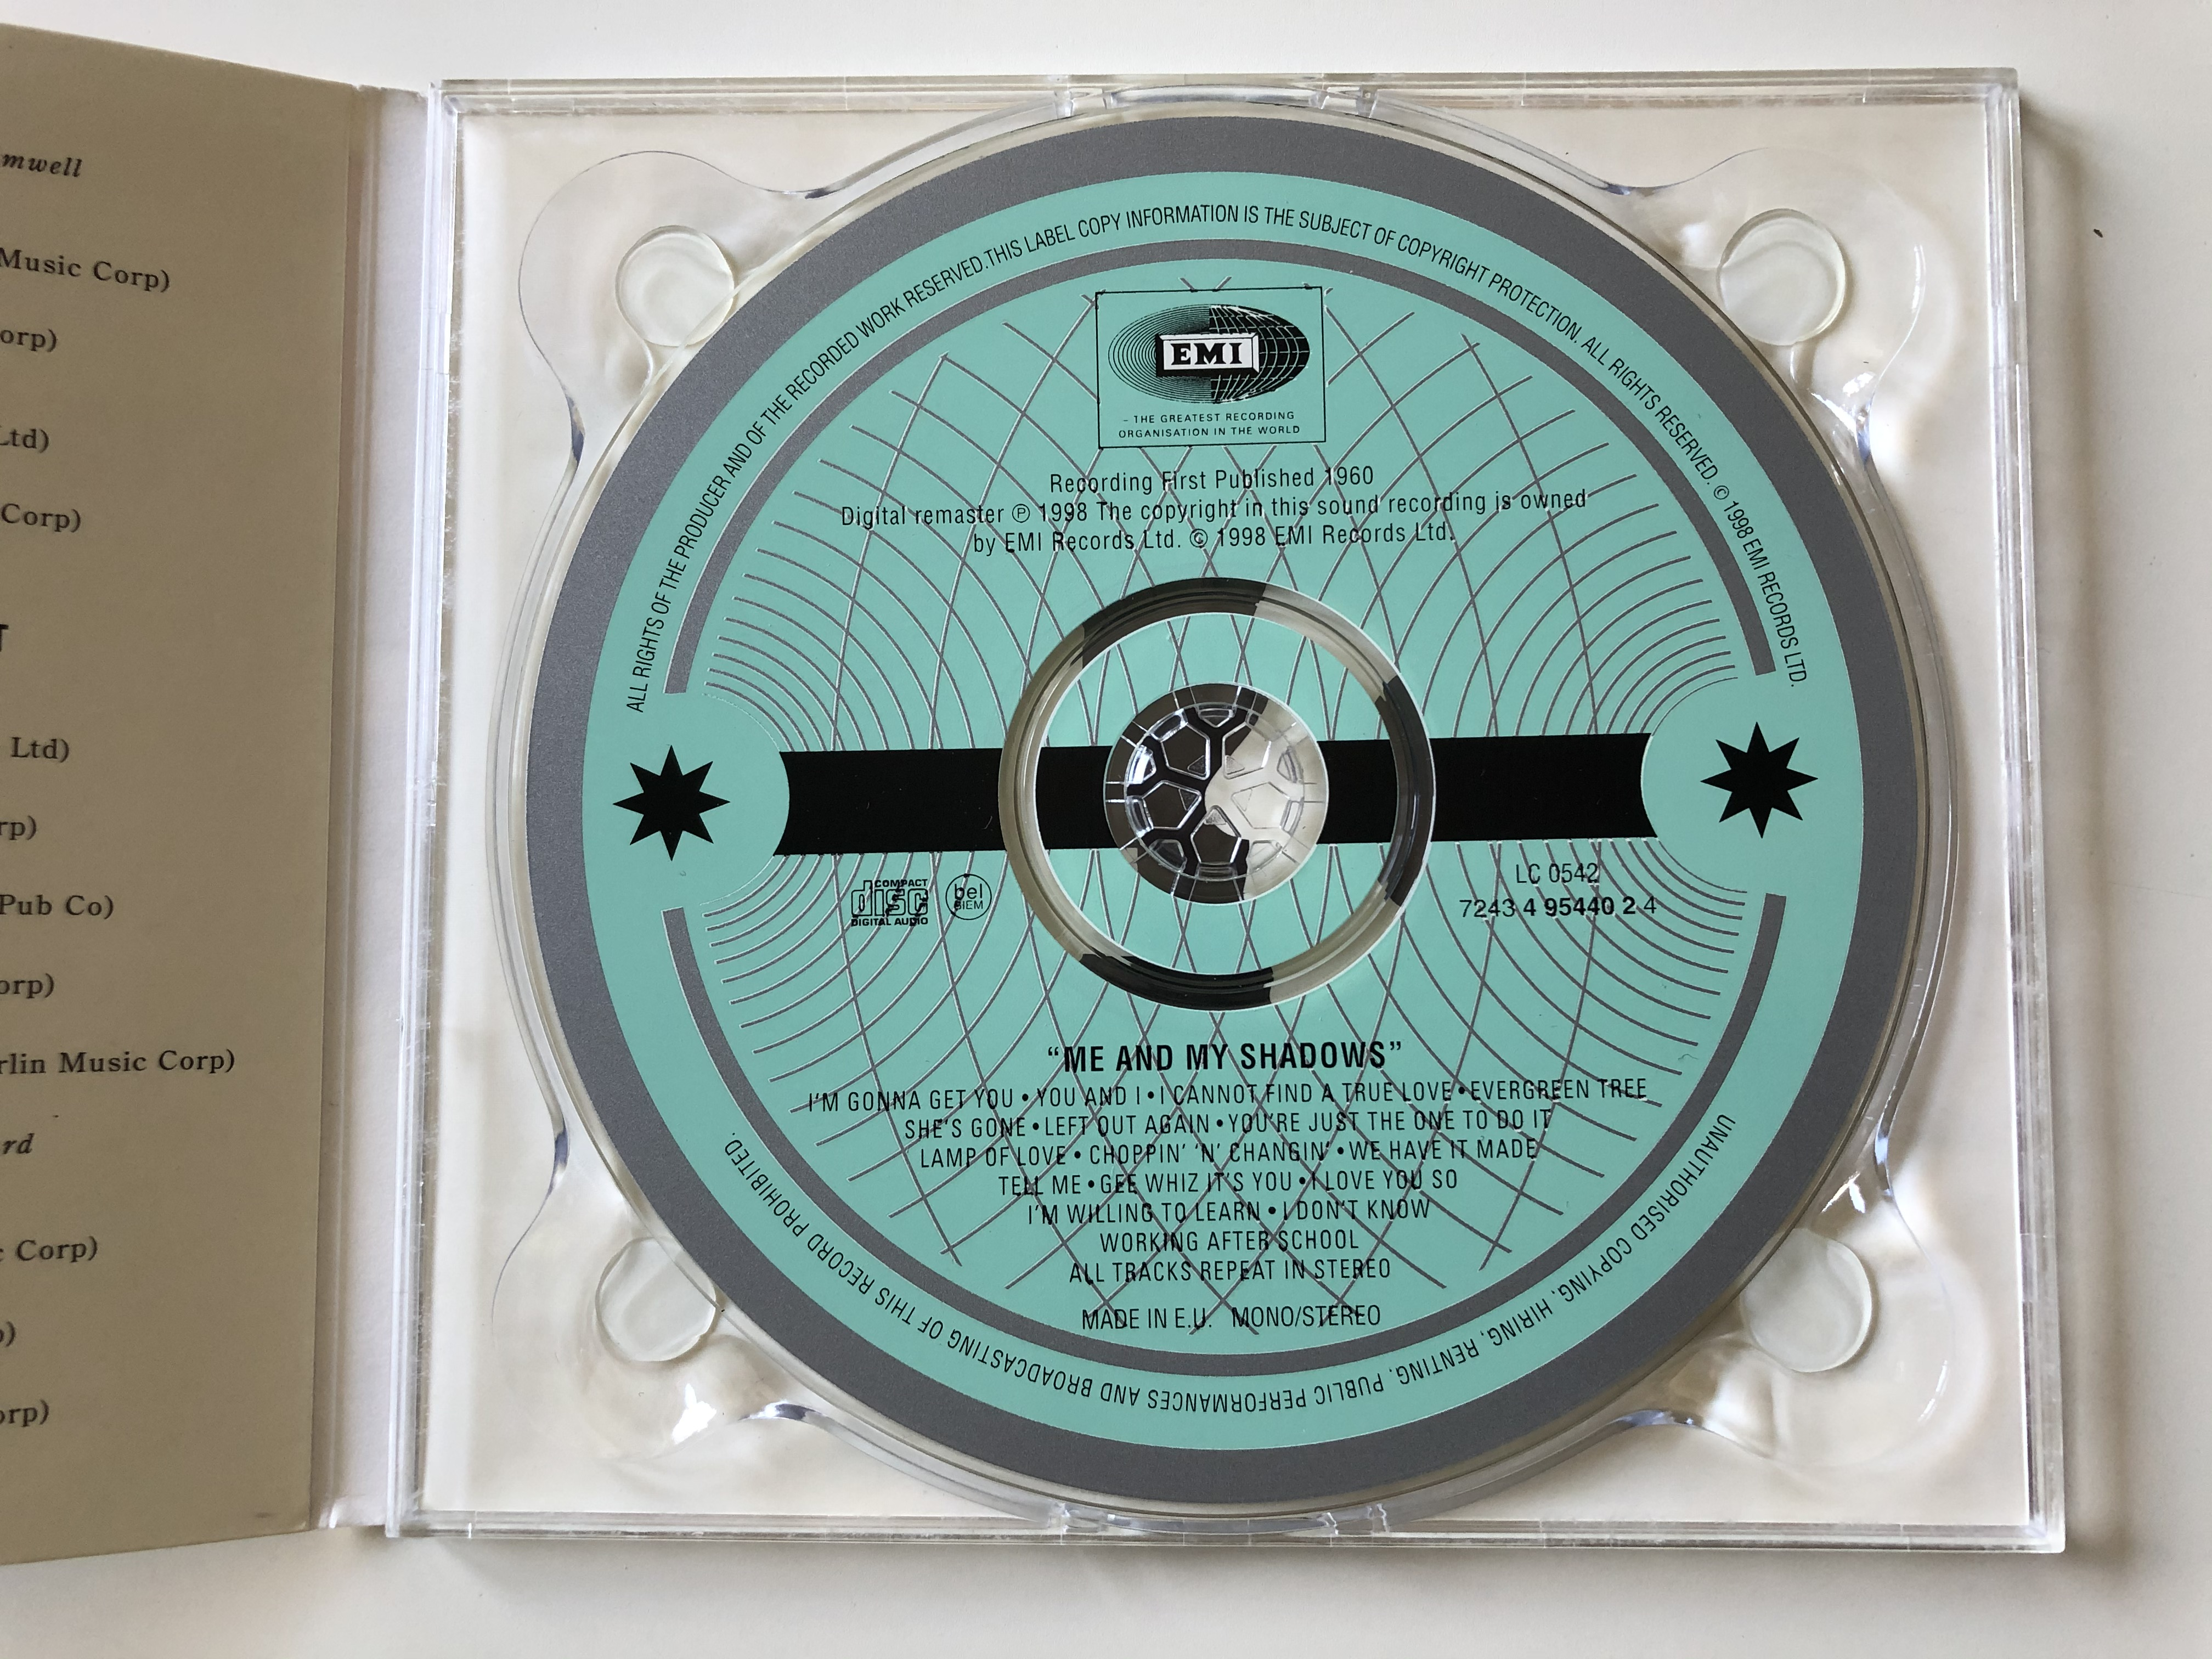 cliff-richard-and-the-shadows-me-and-my-shadows-emi-audio-cd-1998-mono-stereo-724349544024-3-.jpg